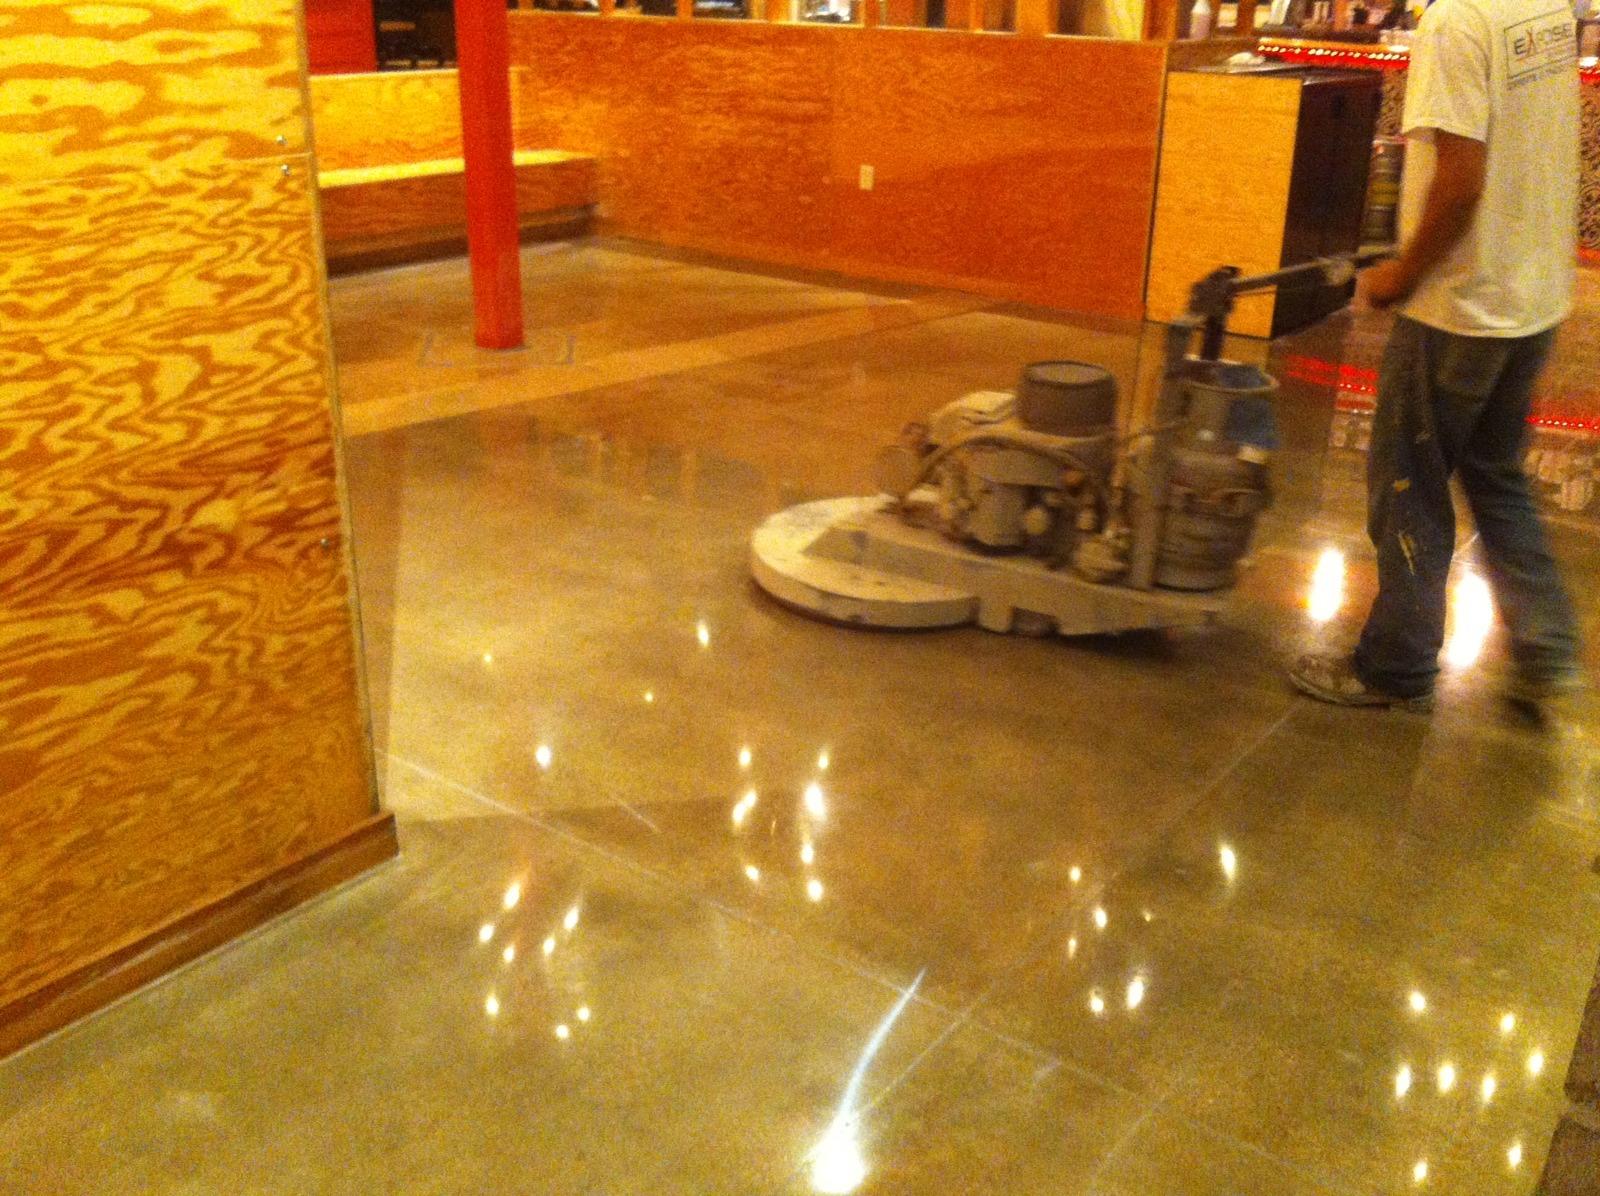 Torchy's Taco Shop Floor - burnishing